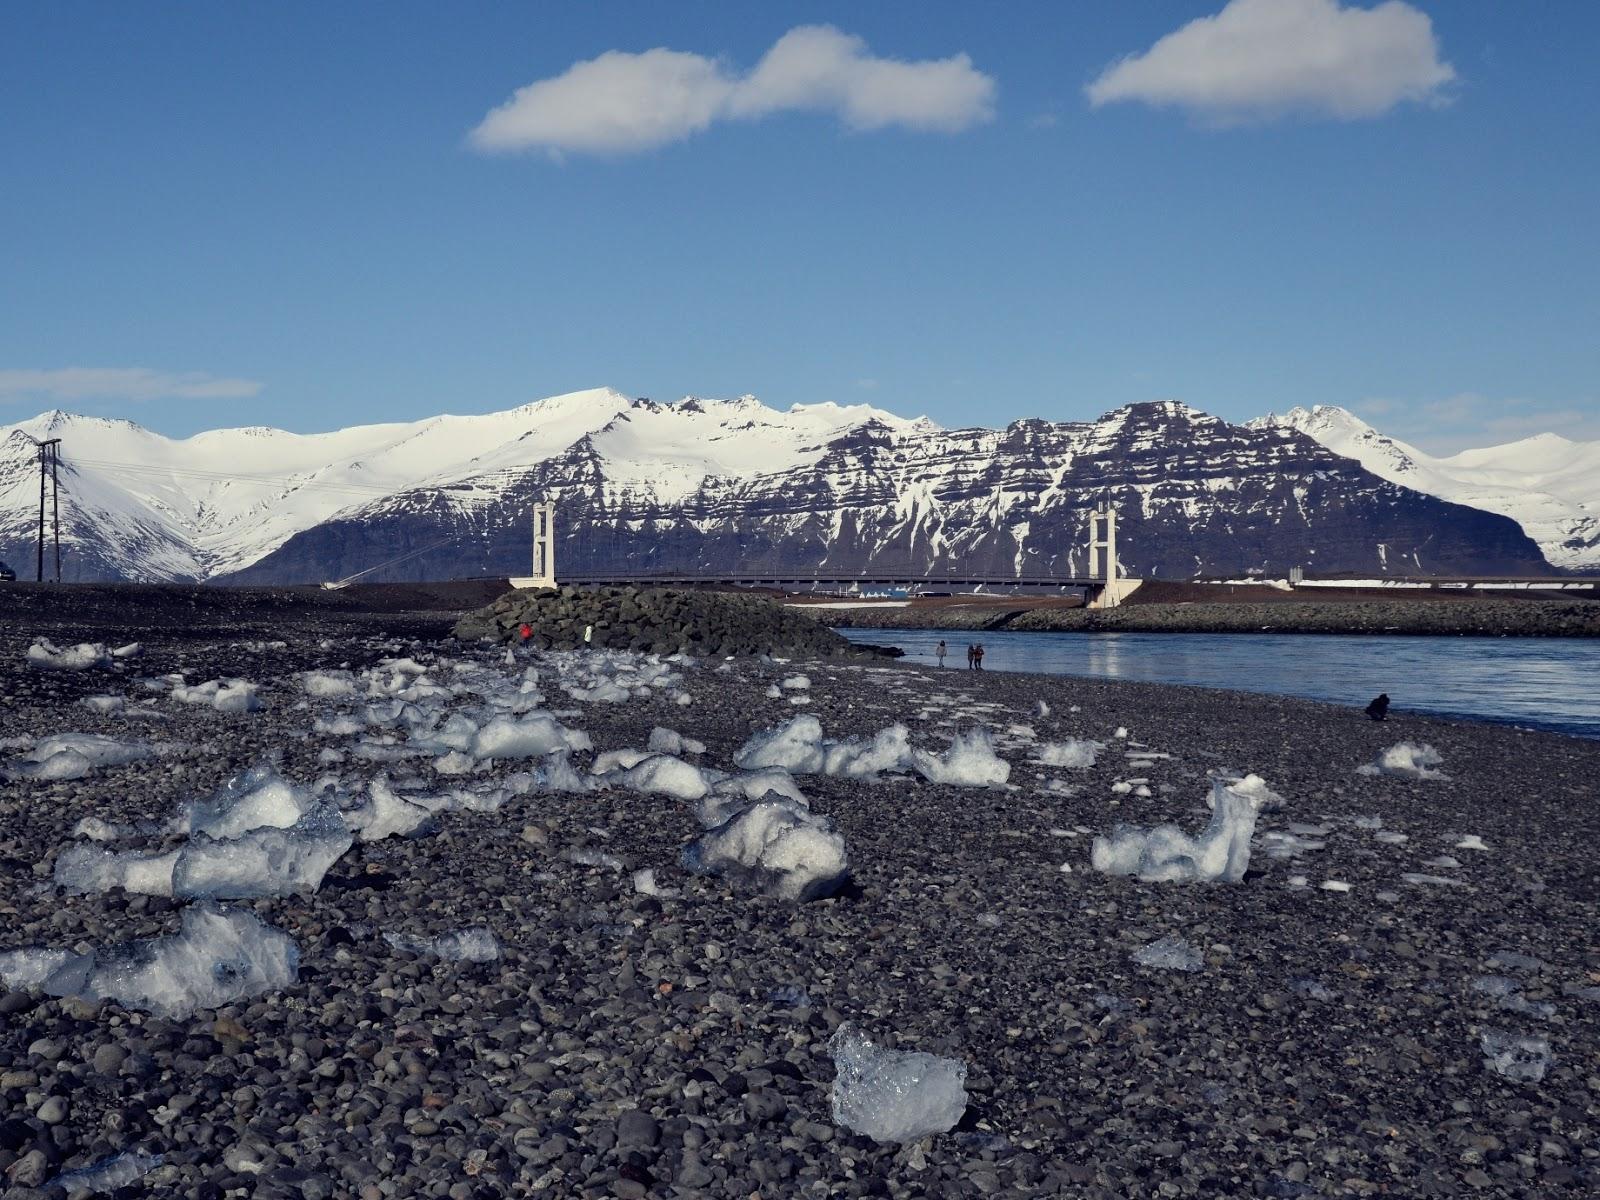 Jokulsa, rzeka, islandzka rzeka, Laguna Lodowcowa, Islandia, Ice Lagoon, Jokulsarlon, lodowiec, jezioro, panidorcia, blog o Islandii